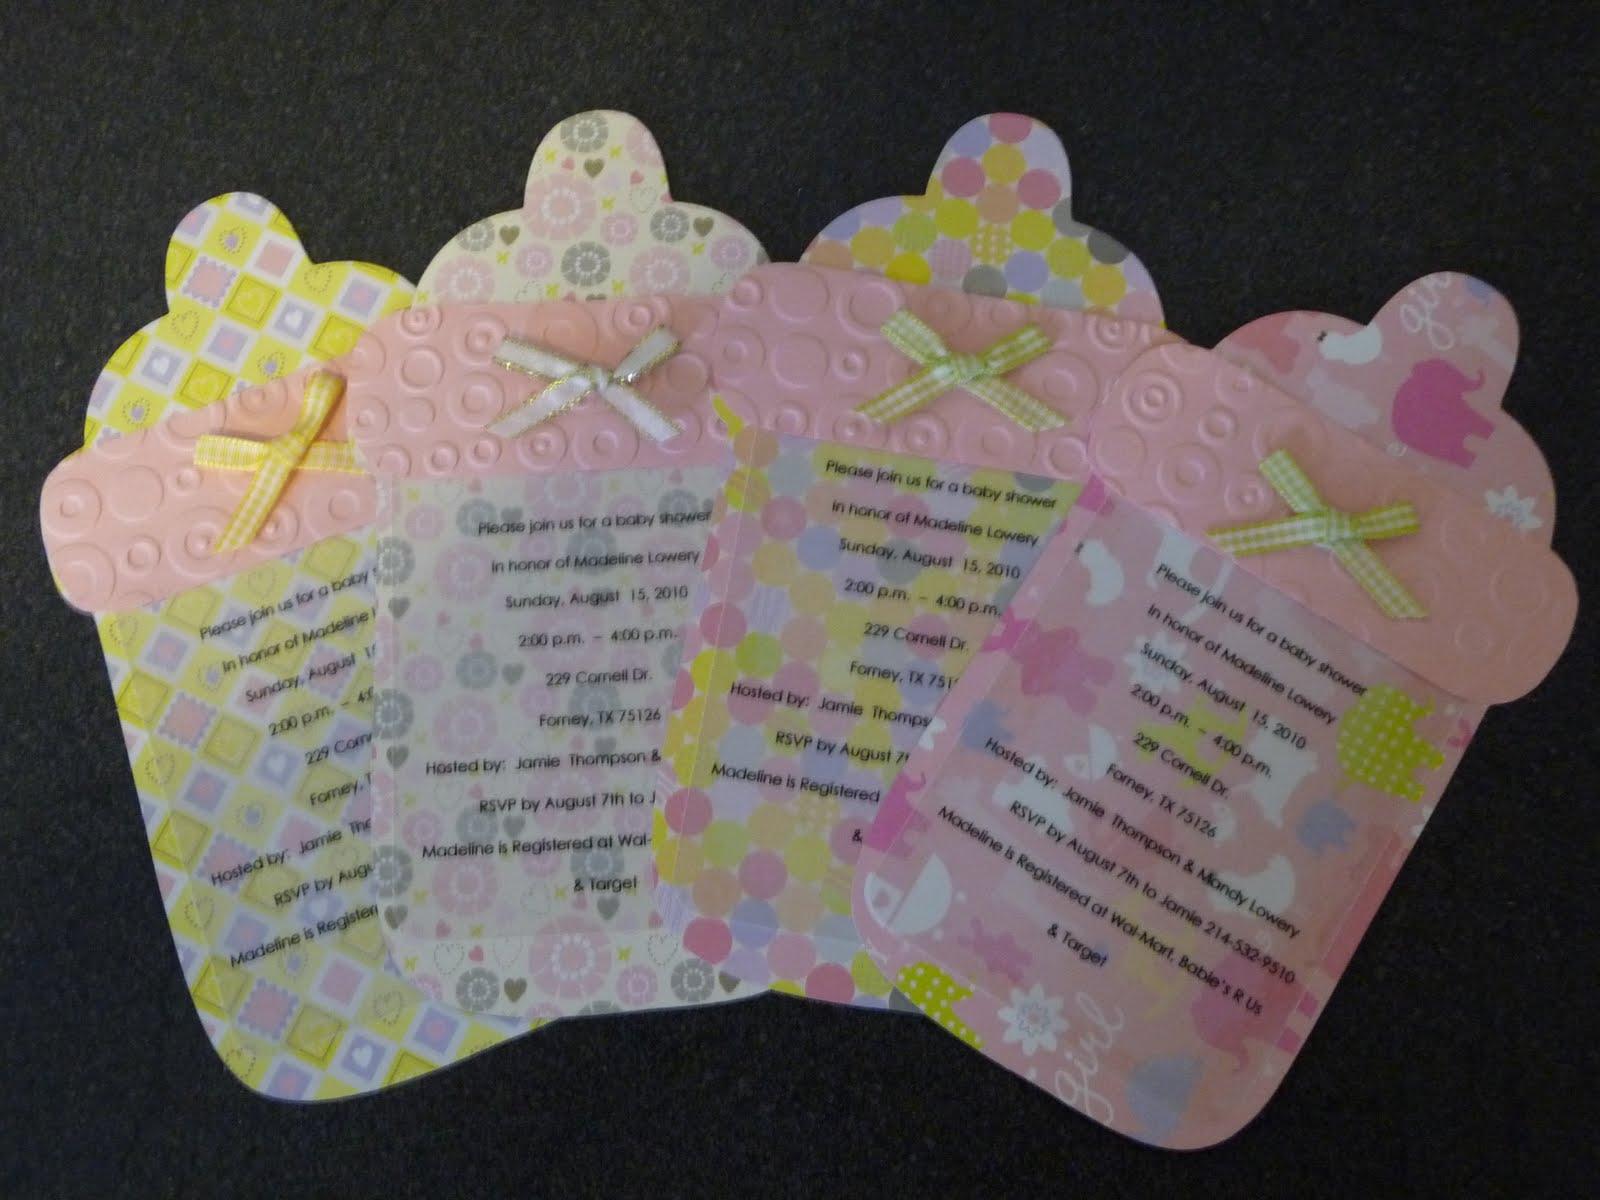 736x552 736 x 552 jpeg 64 kb cricut baby shower invitations my cricut